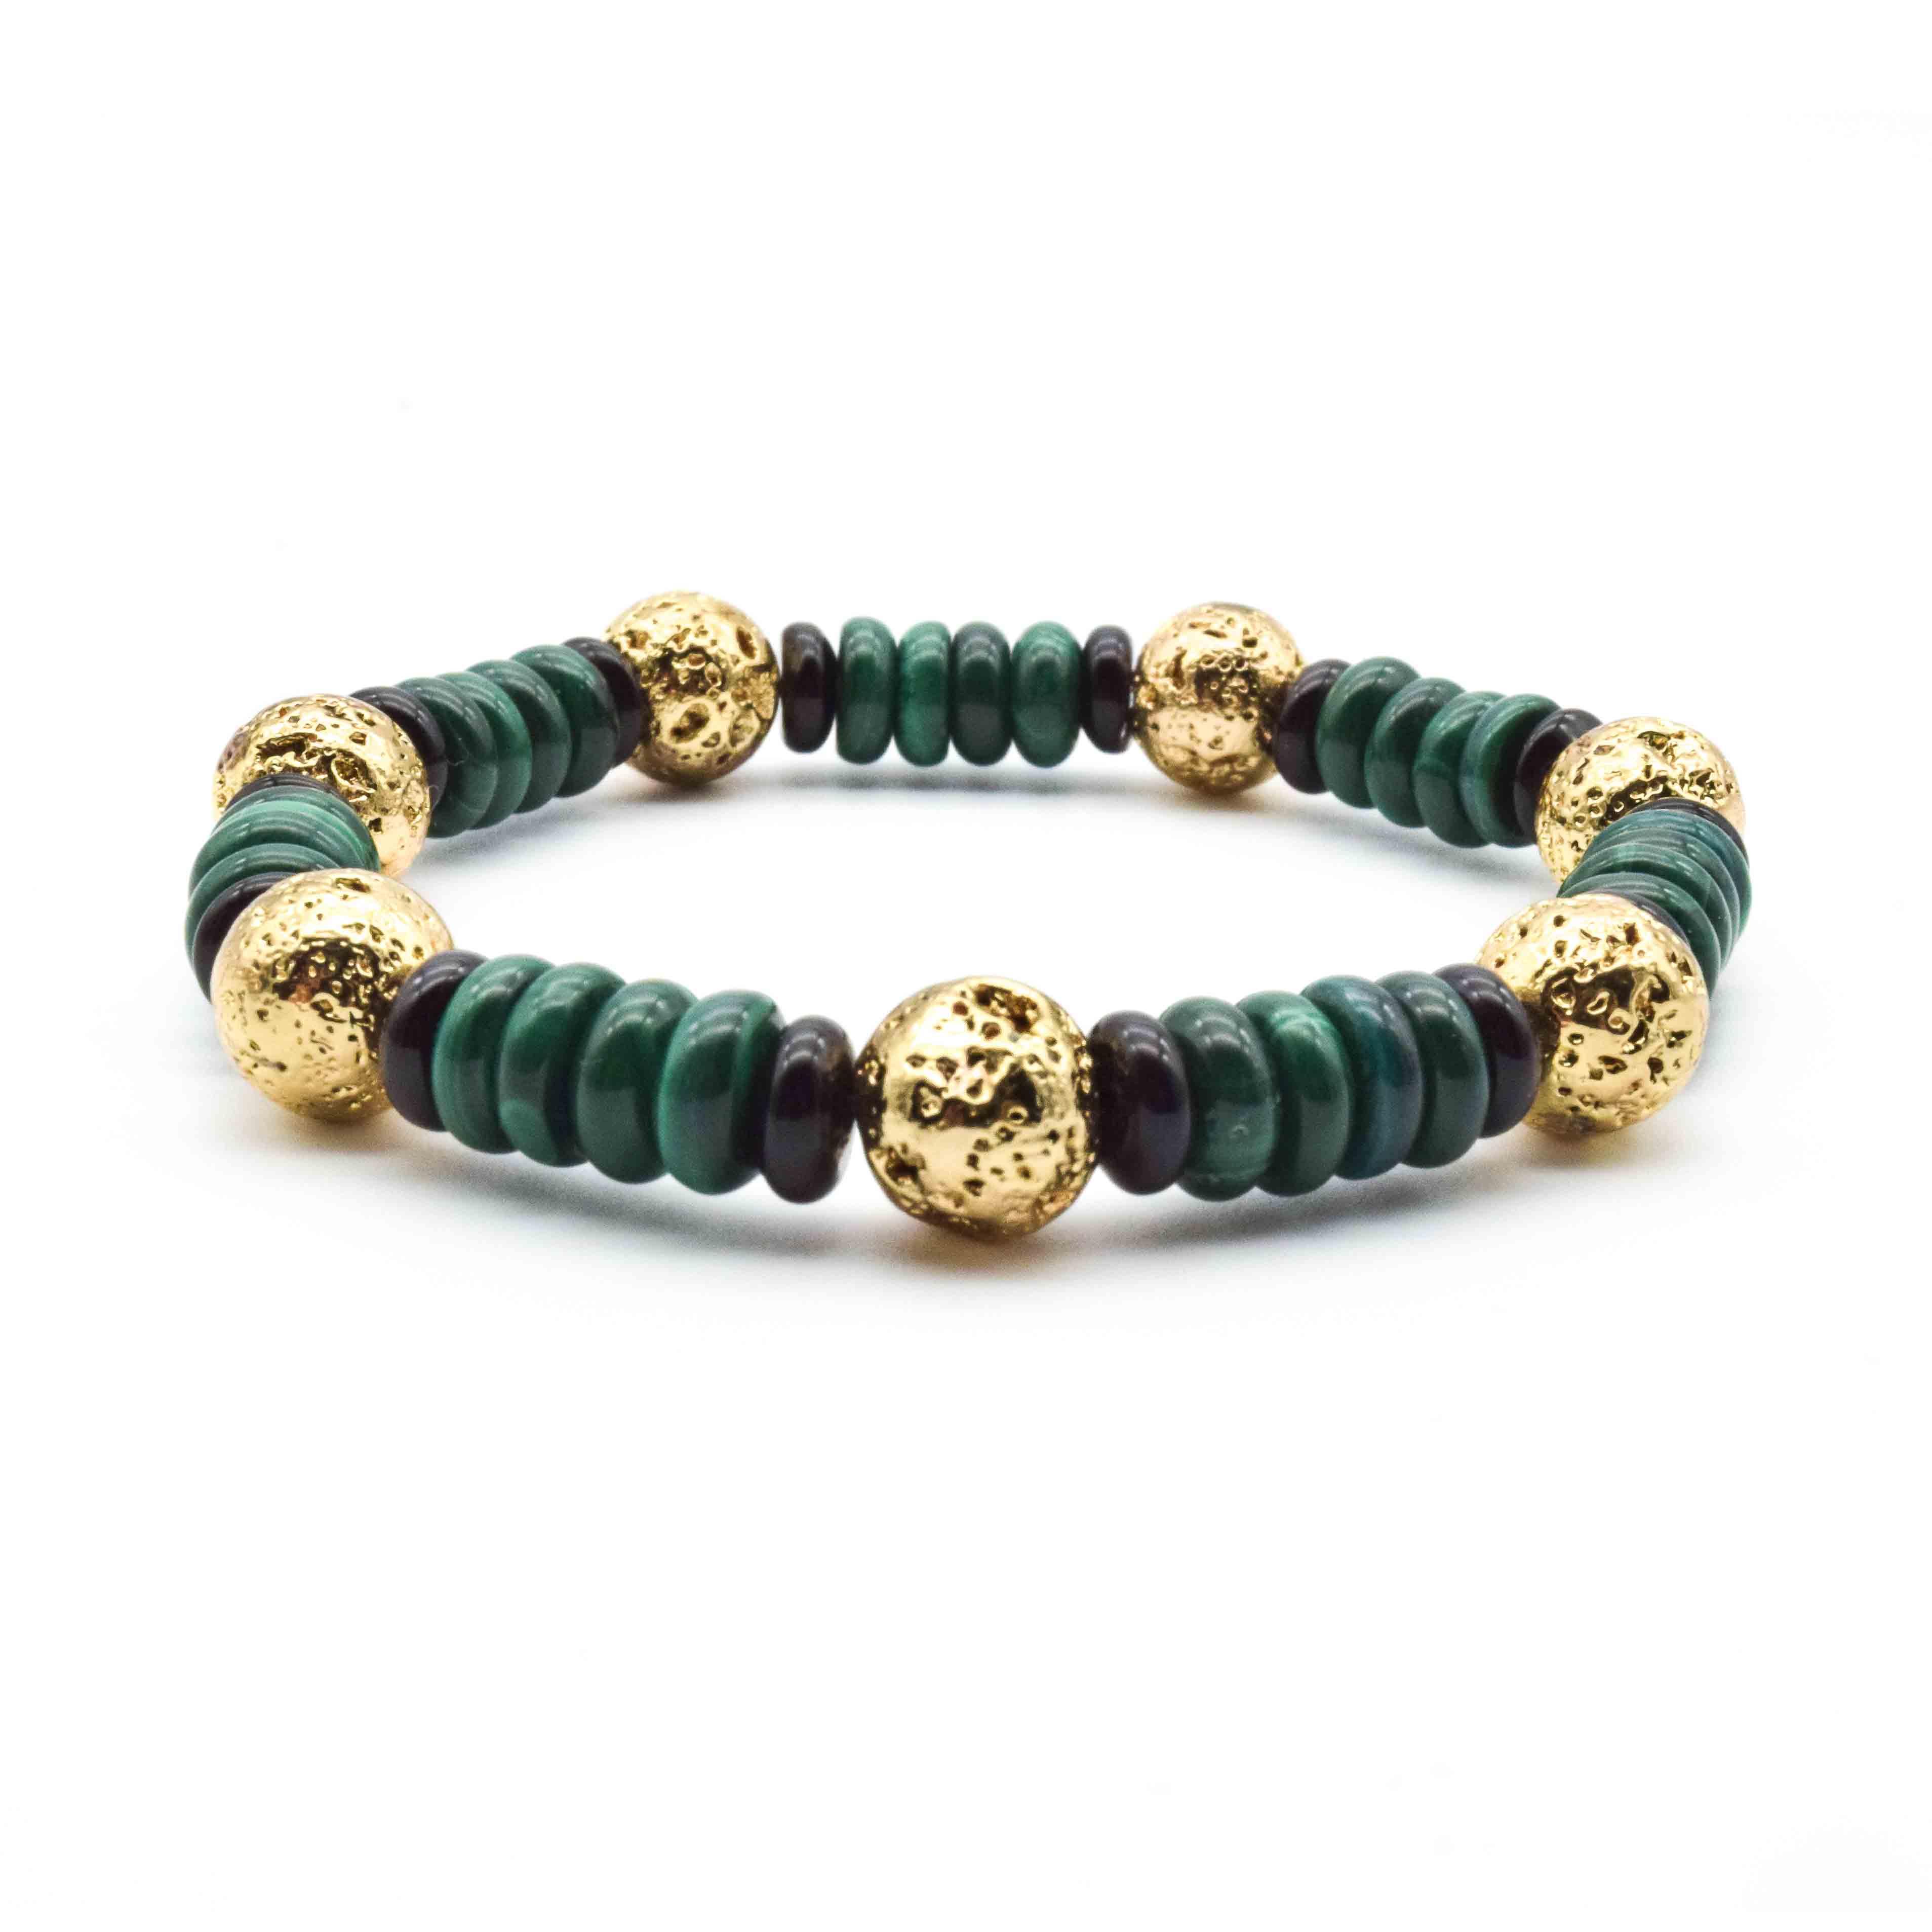 9313ca19c62 Gold Lava and Malachite Bracelet, malachite bracelet, gold bracelet, mens  bracelet, designer